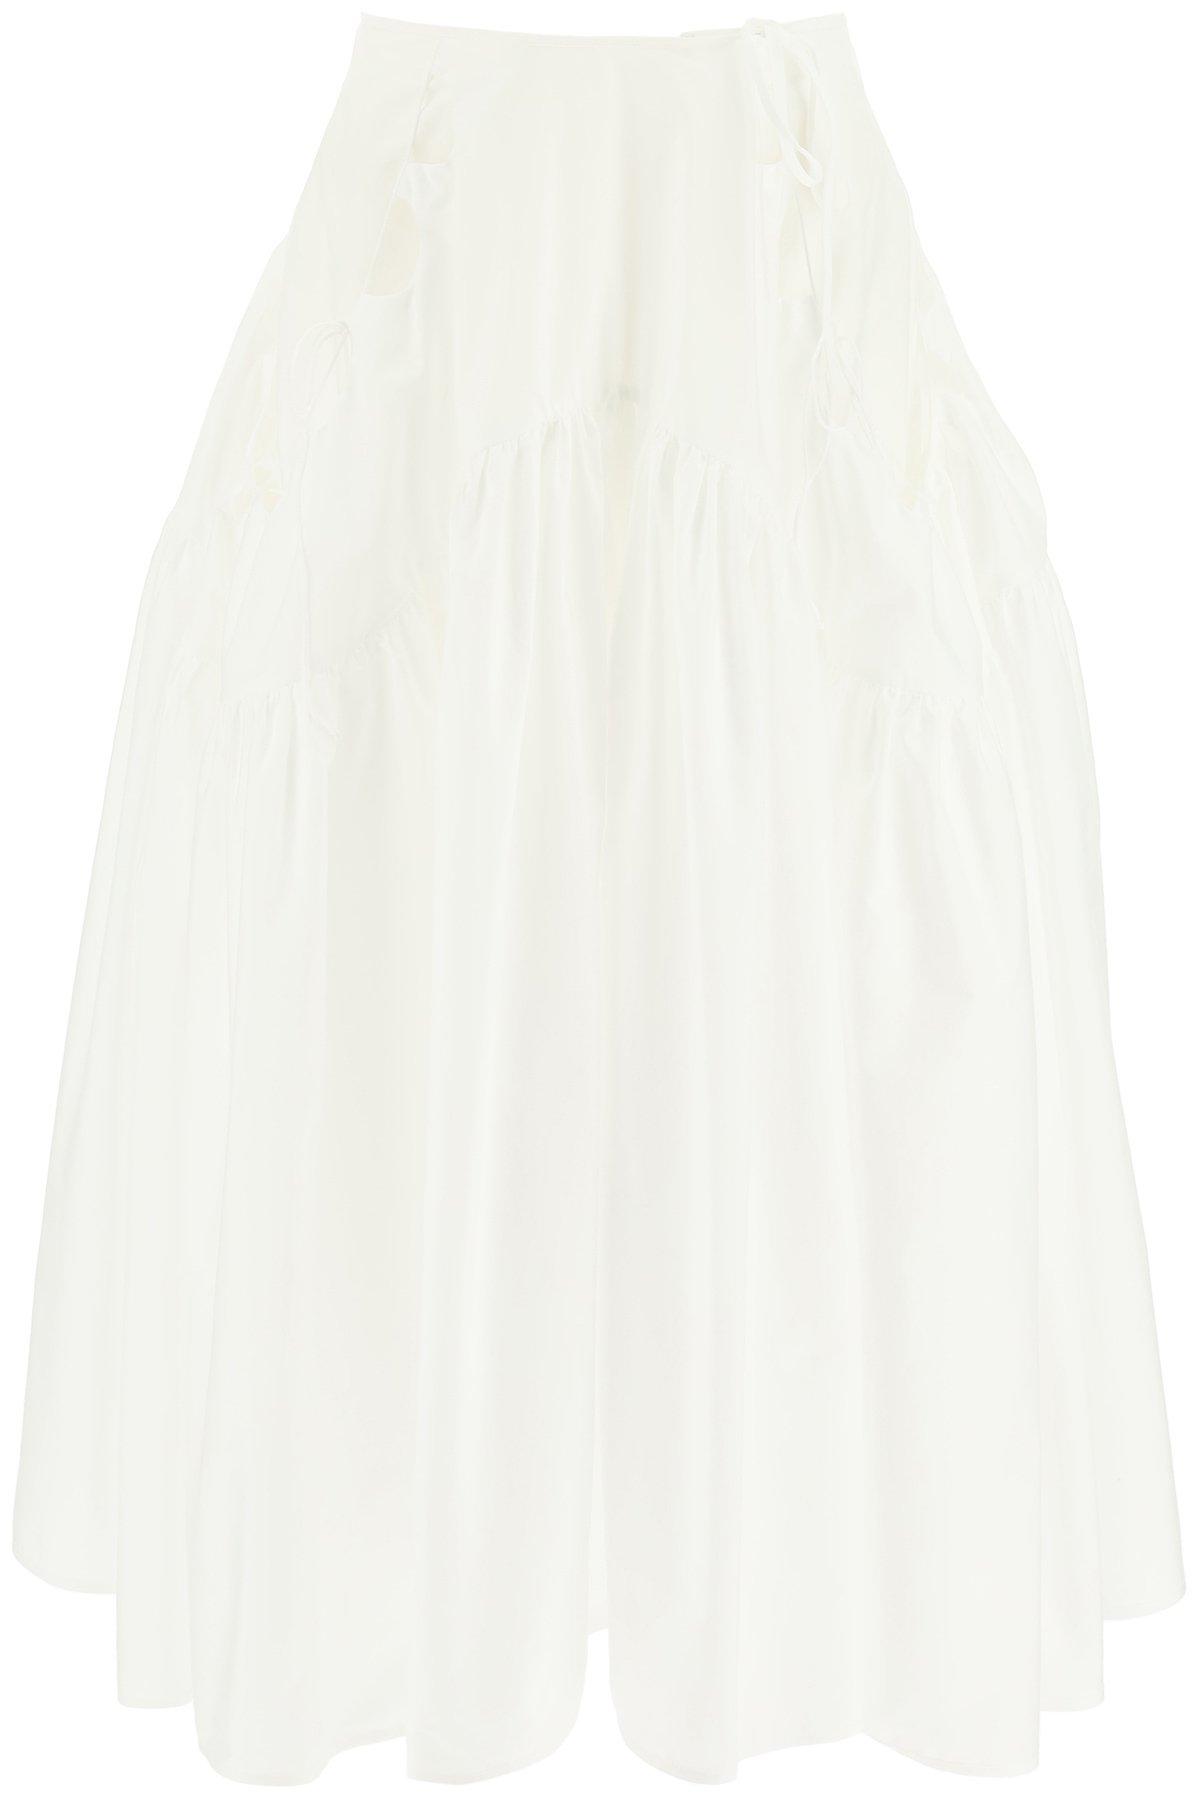 Cecilie bahnsen honey cotton skirt